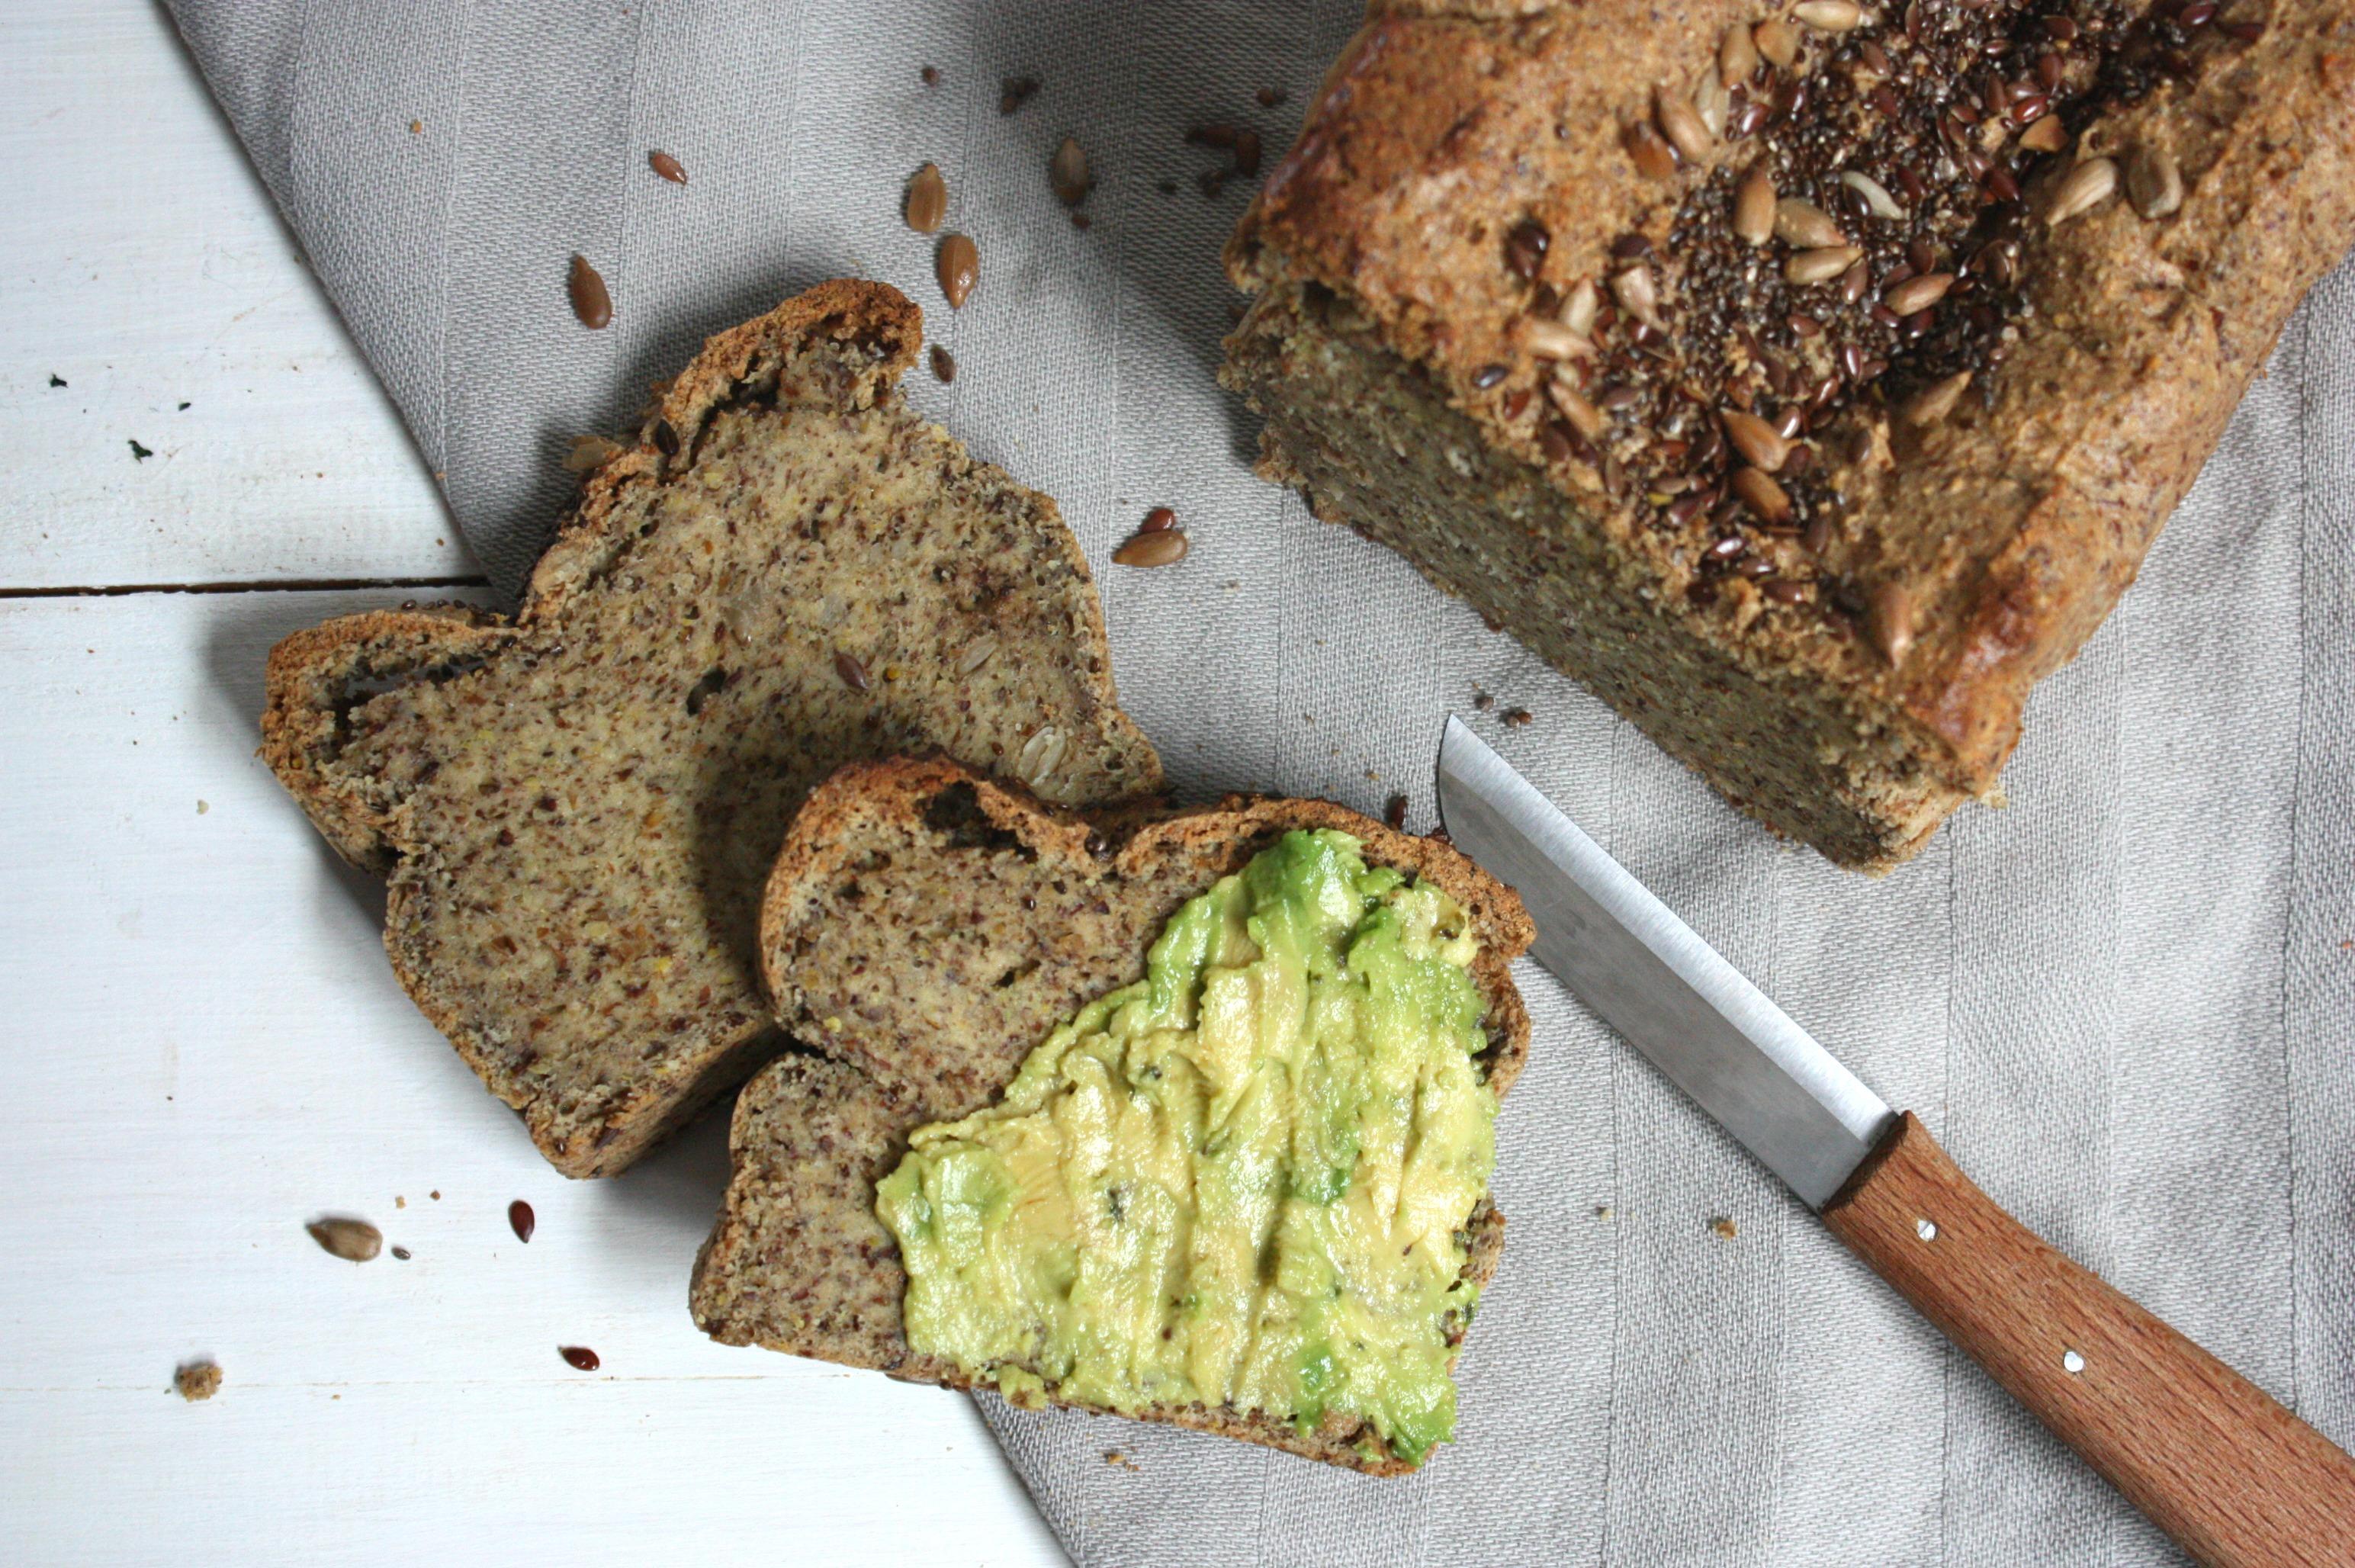 Pan paleo de almendras y lino, por Gina Estapé